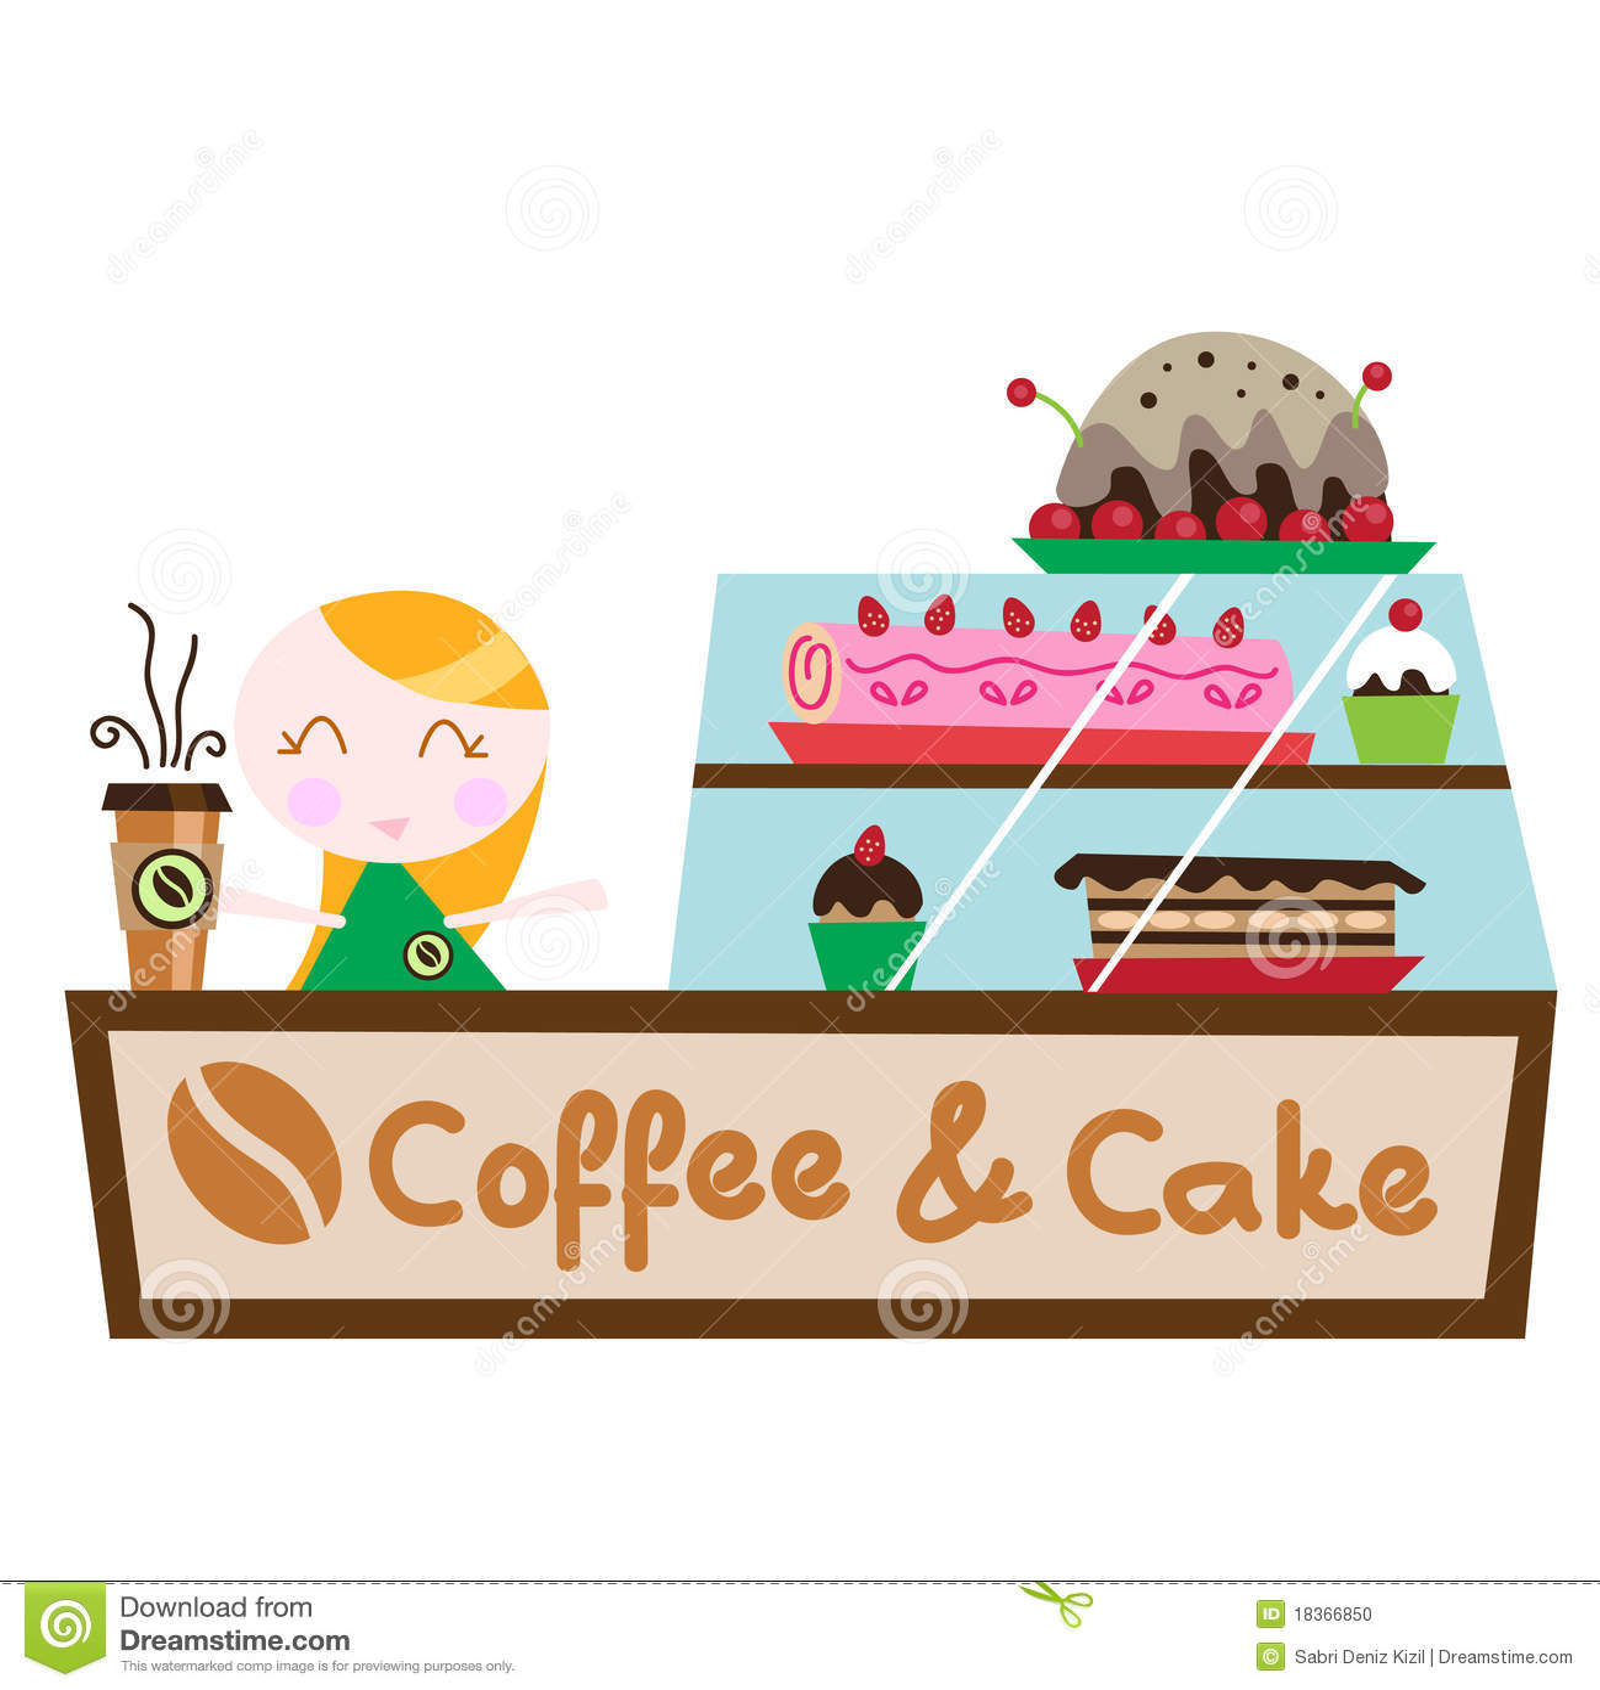 Raw Coffee Cake